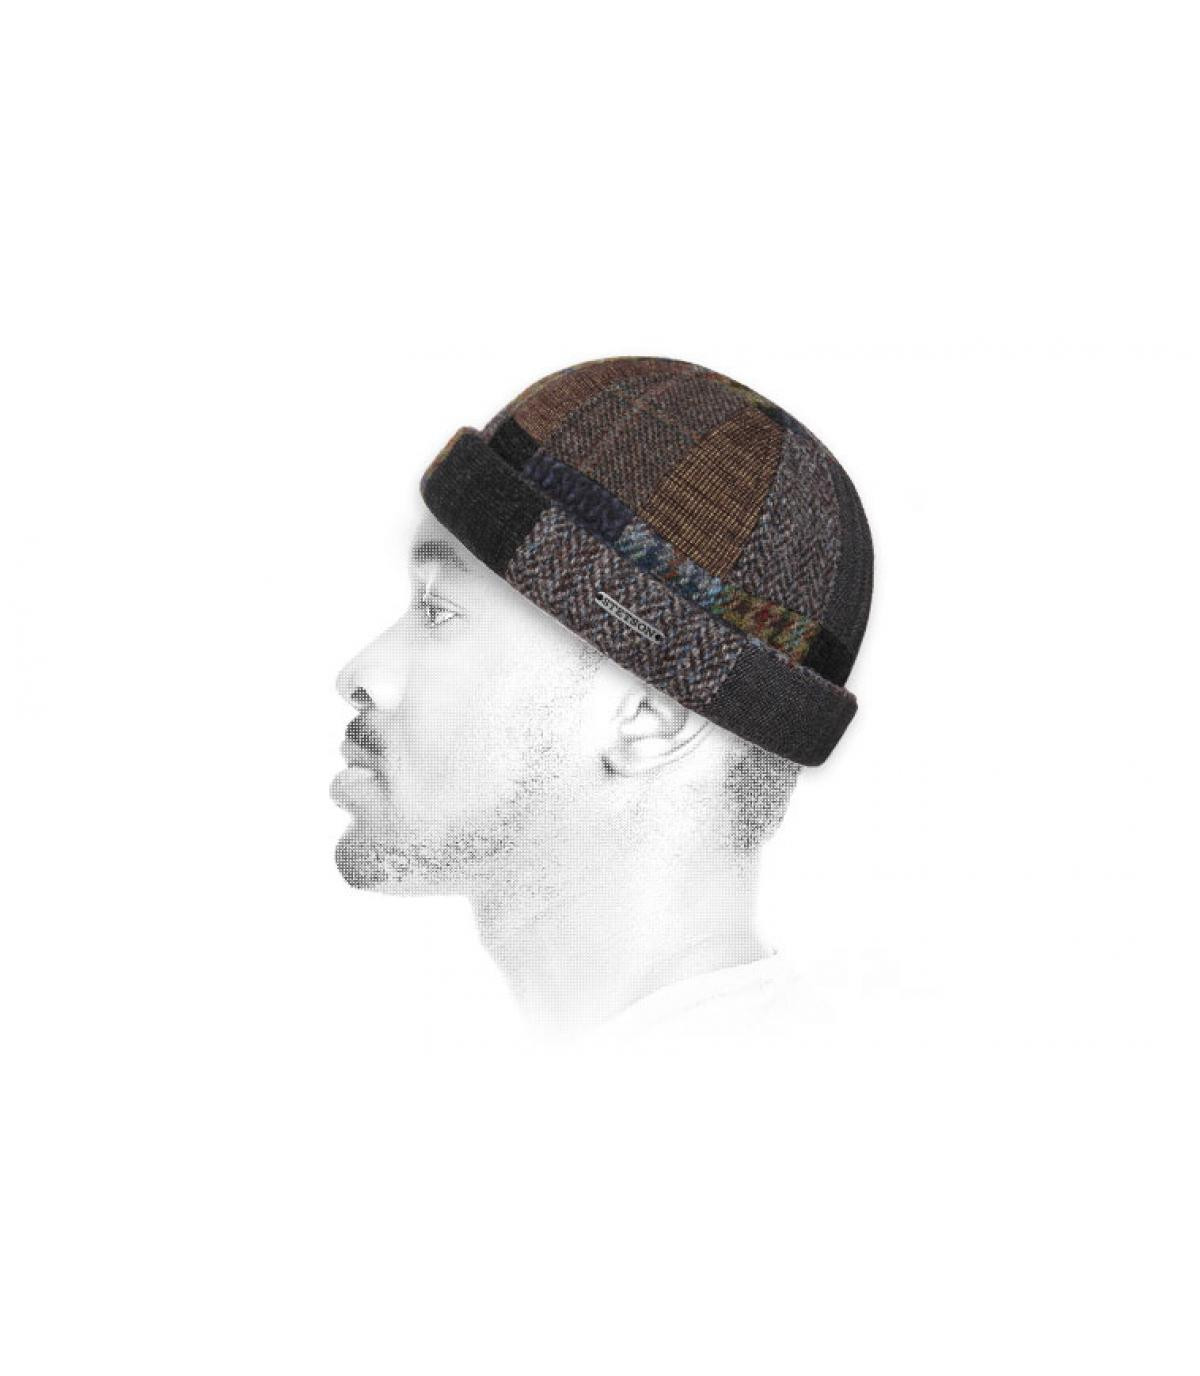 lana patchwork cappello docker